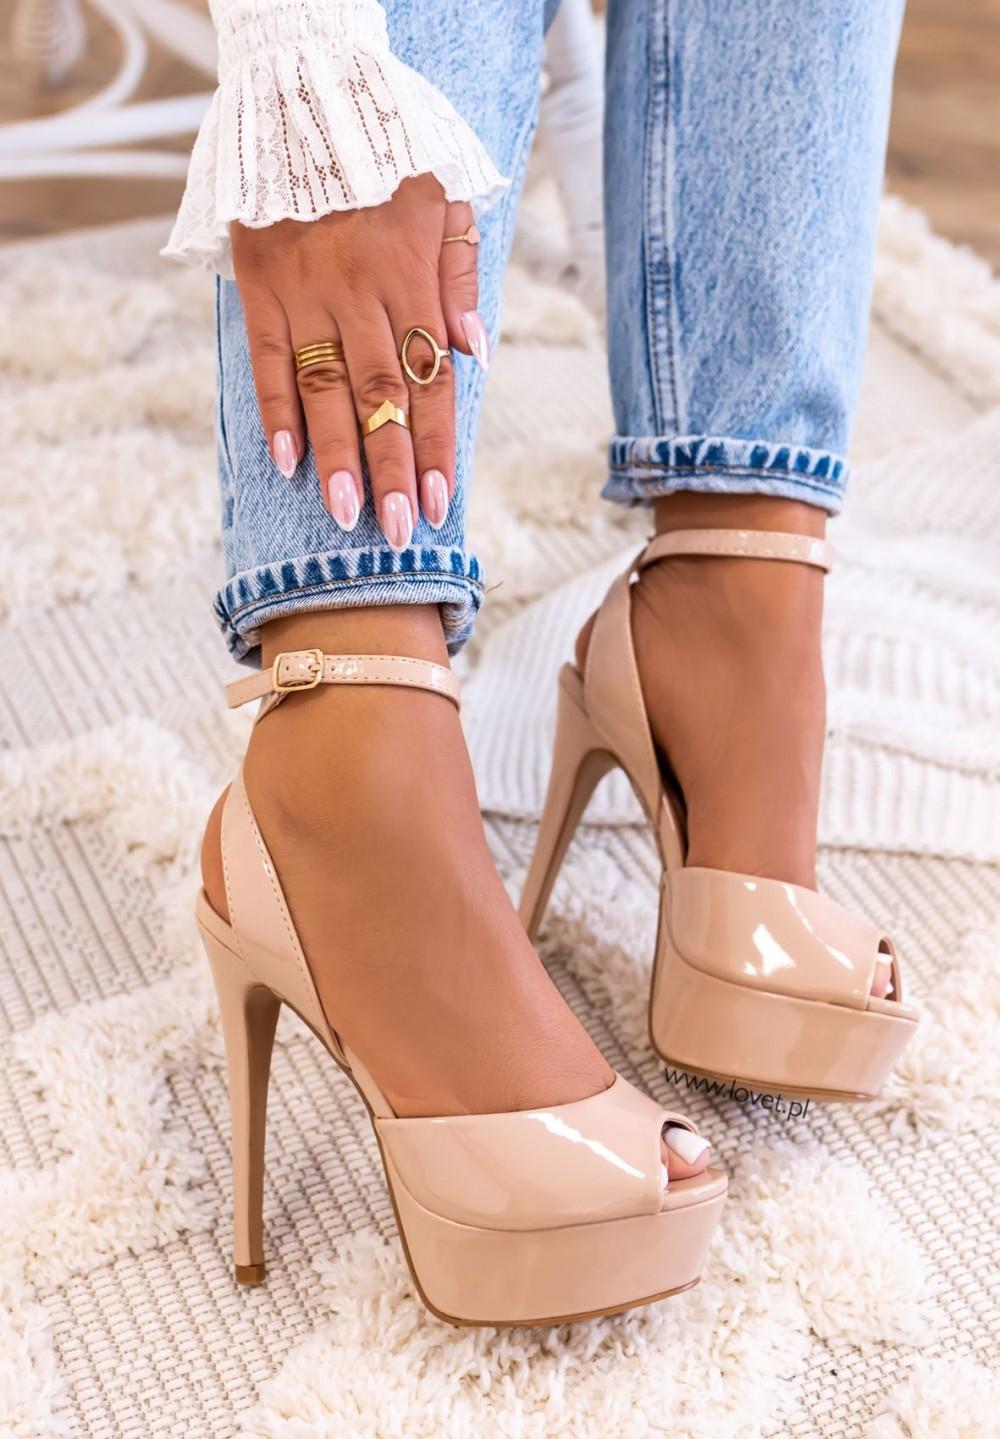 Sandałki Platformy Lakierowane Beżowe Sylvie